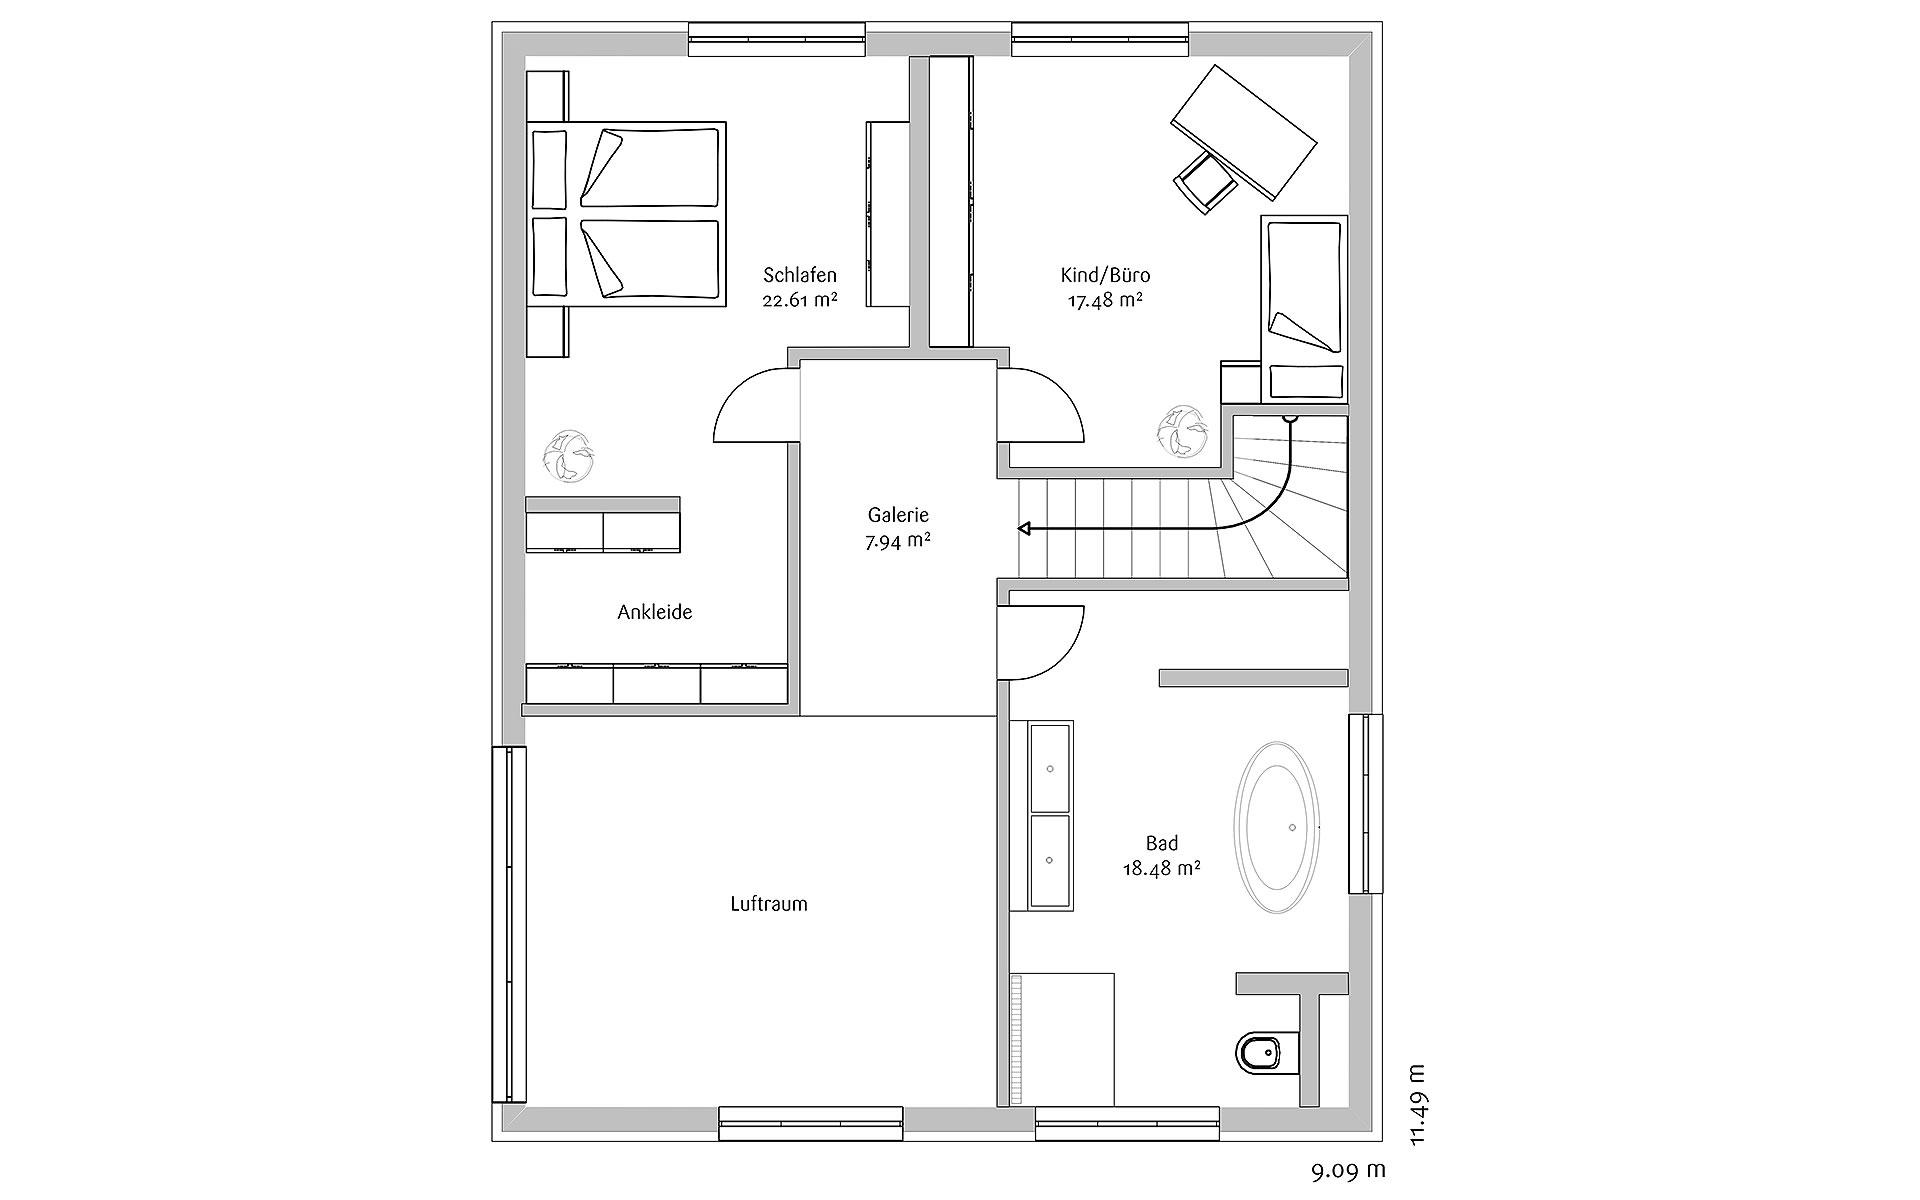 Dachgeschoss Klassisch 156 von FischerHaus GmbH & Co. KG